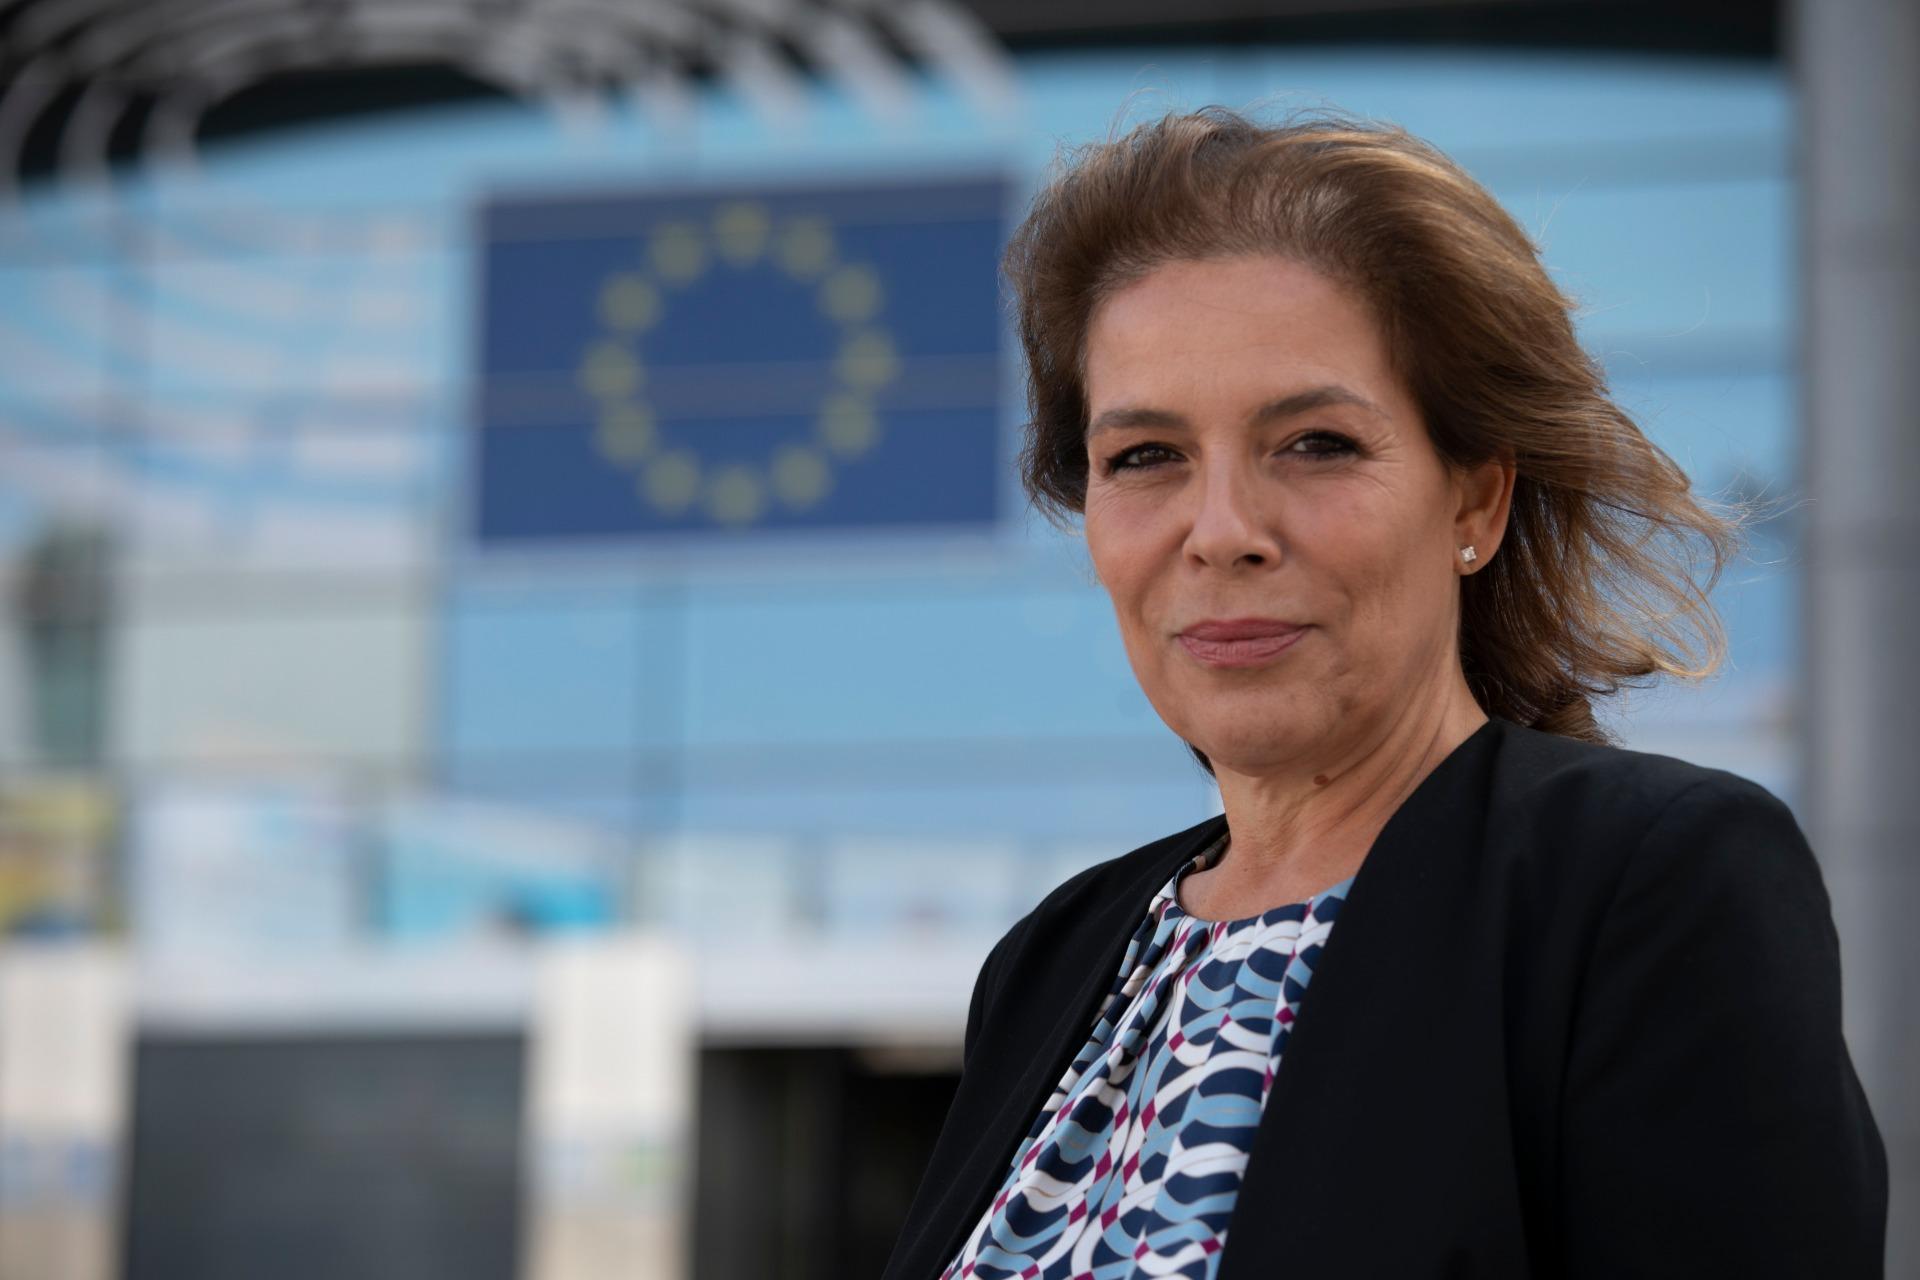 Daniela Rondinelli MEP